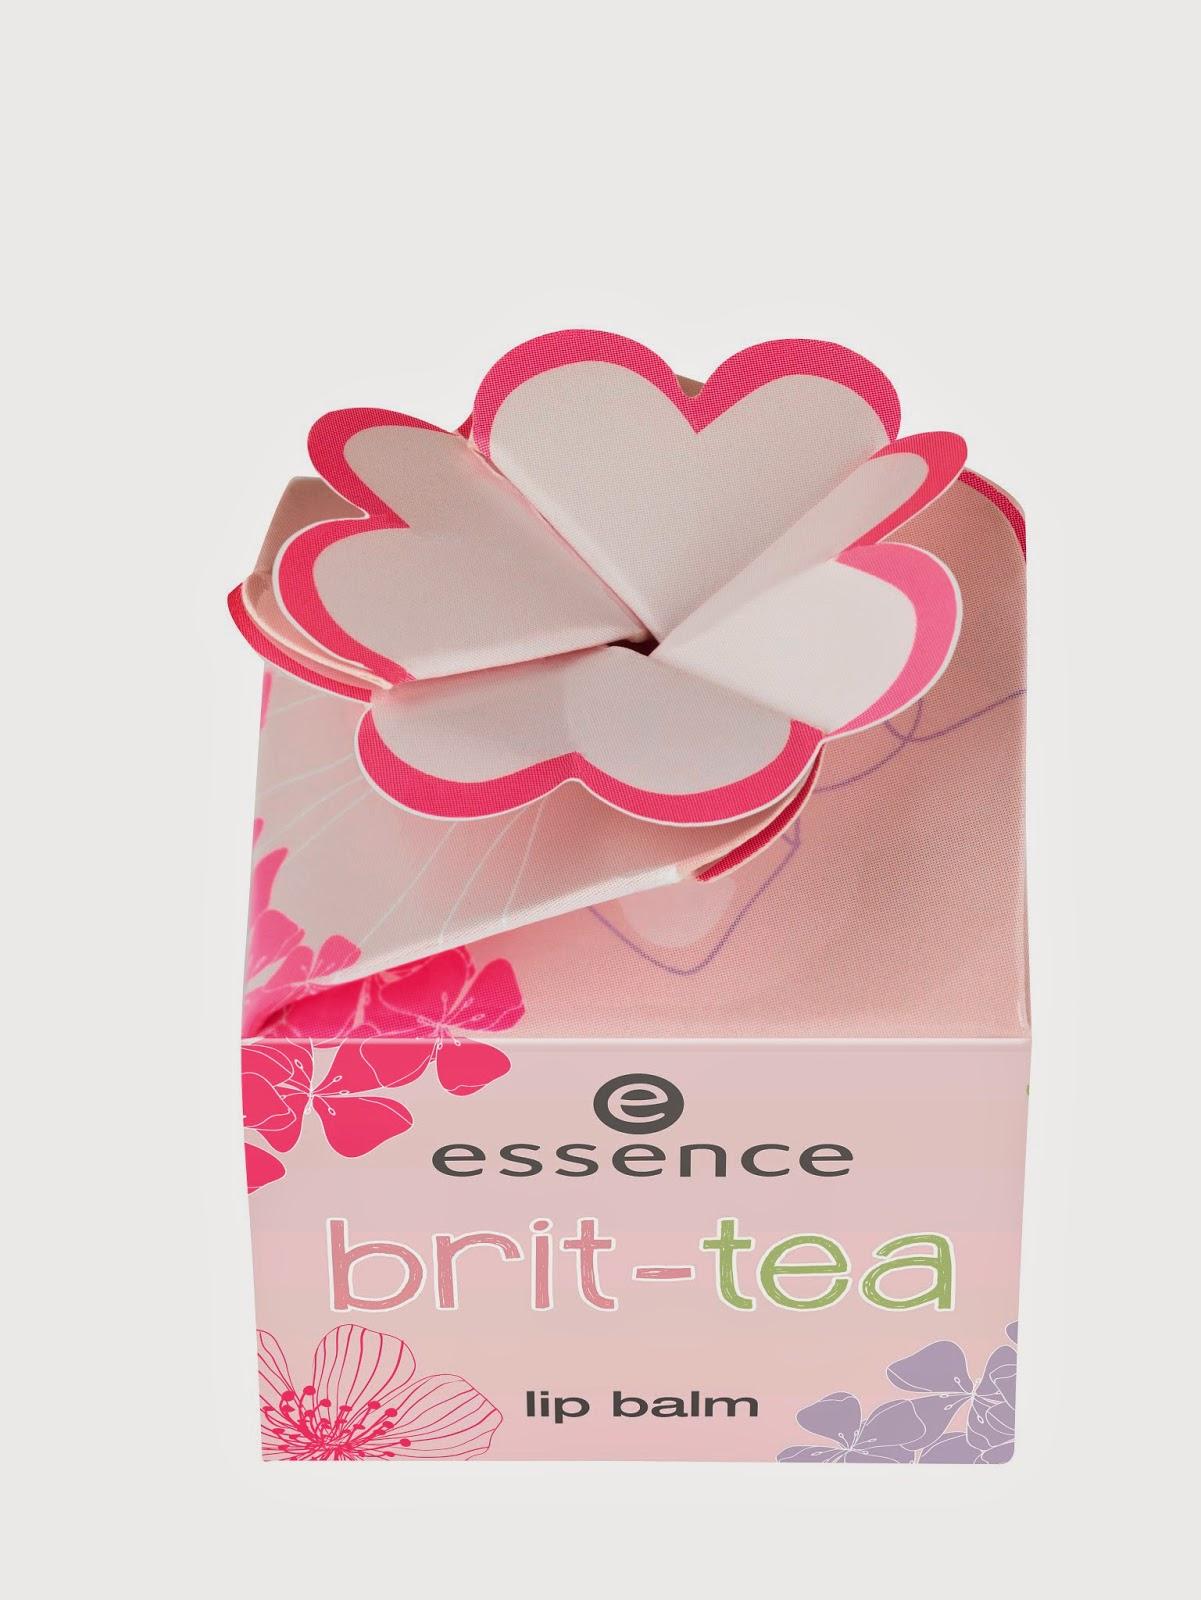 essence brit-tea – lip balm - www.annitschkasblog.de